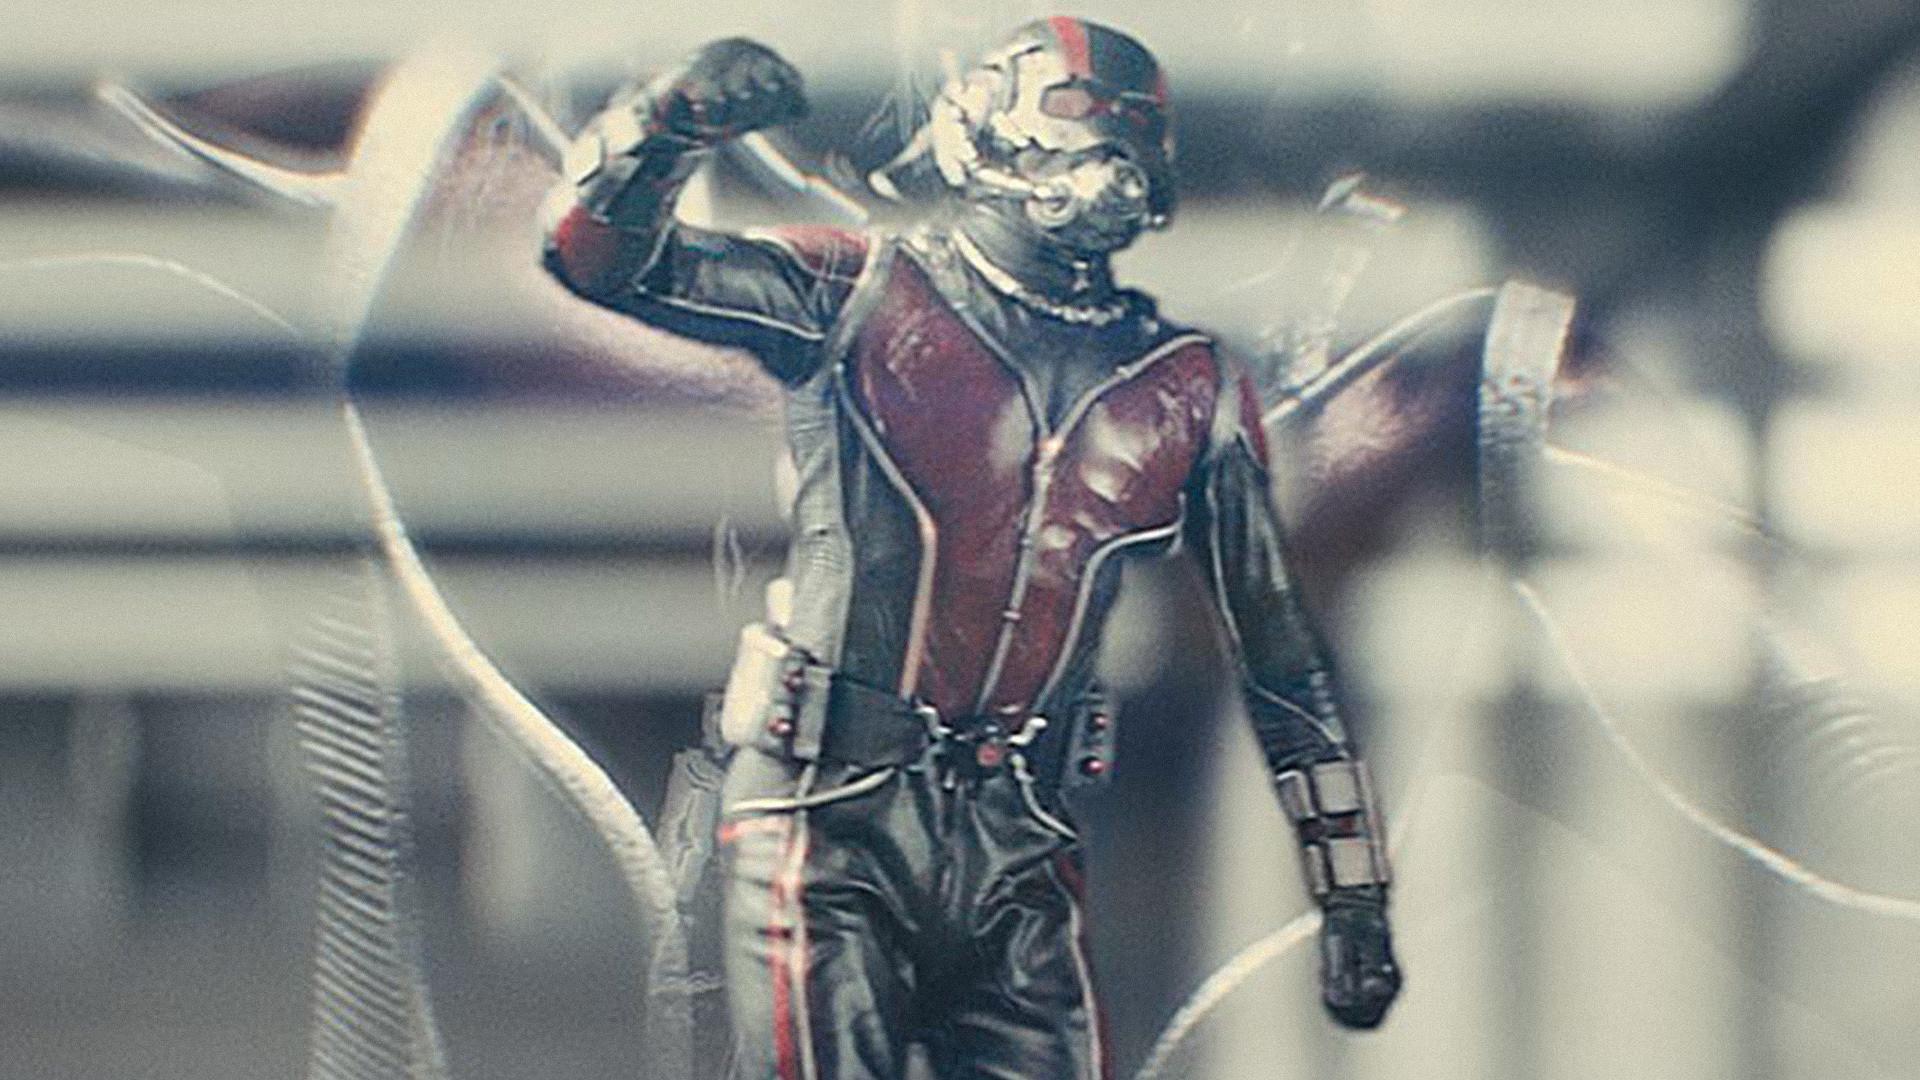 Ant man wallpapers 79 images - Man wallpaper ...